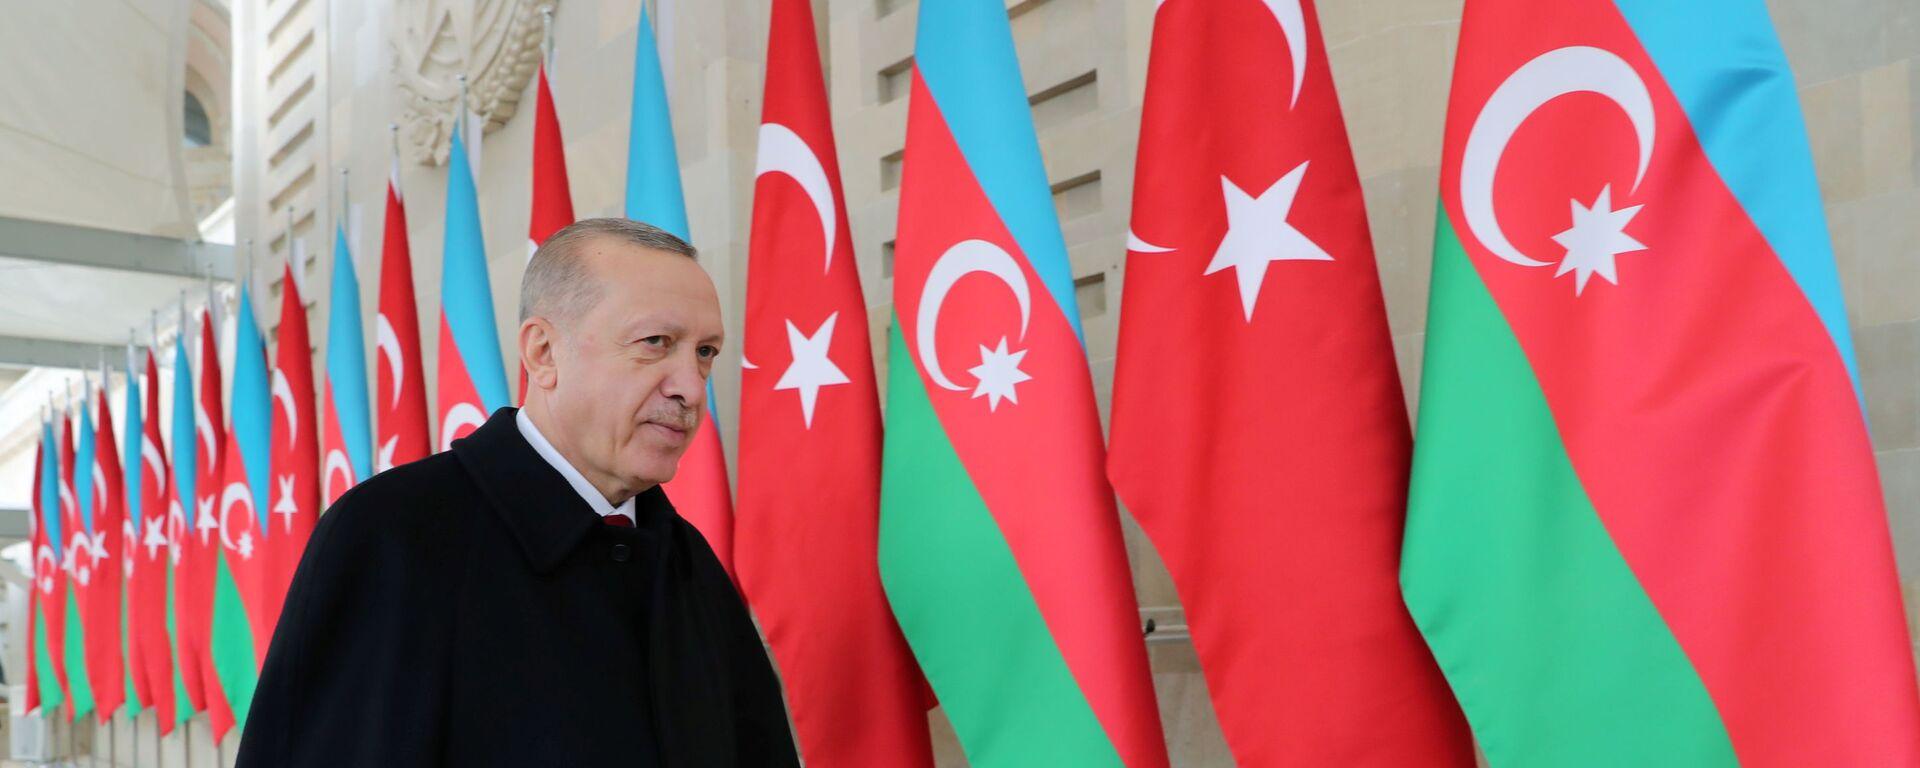 Президент Турции Реджеп Тайип Эрдоган в Баку, фото из архива - Sputnik Азербайджан, 1920, 26.02.2021